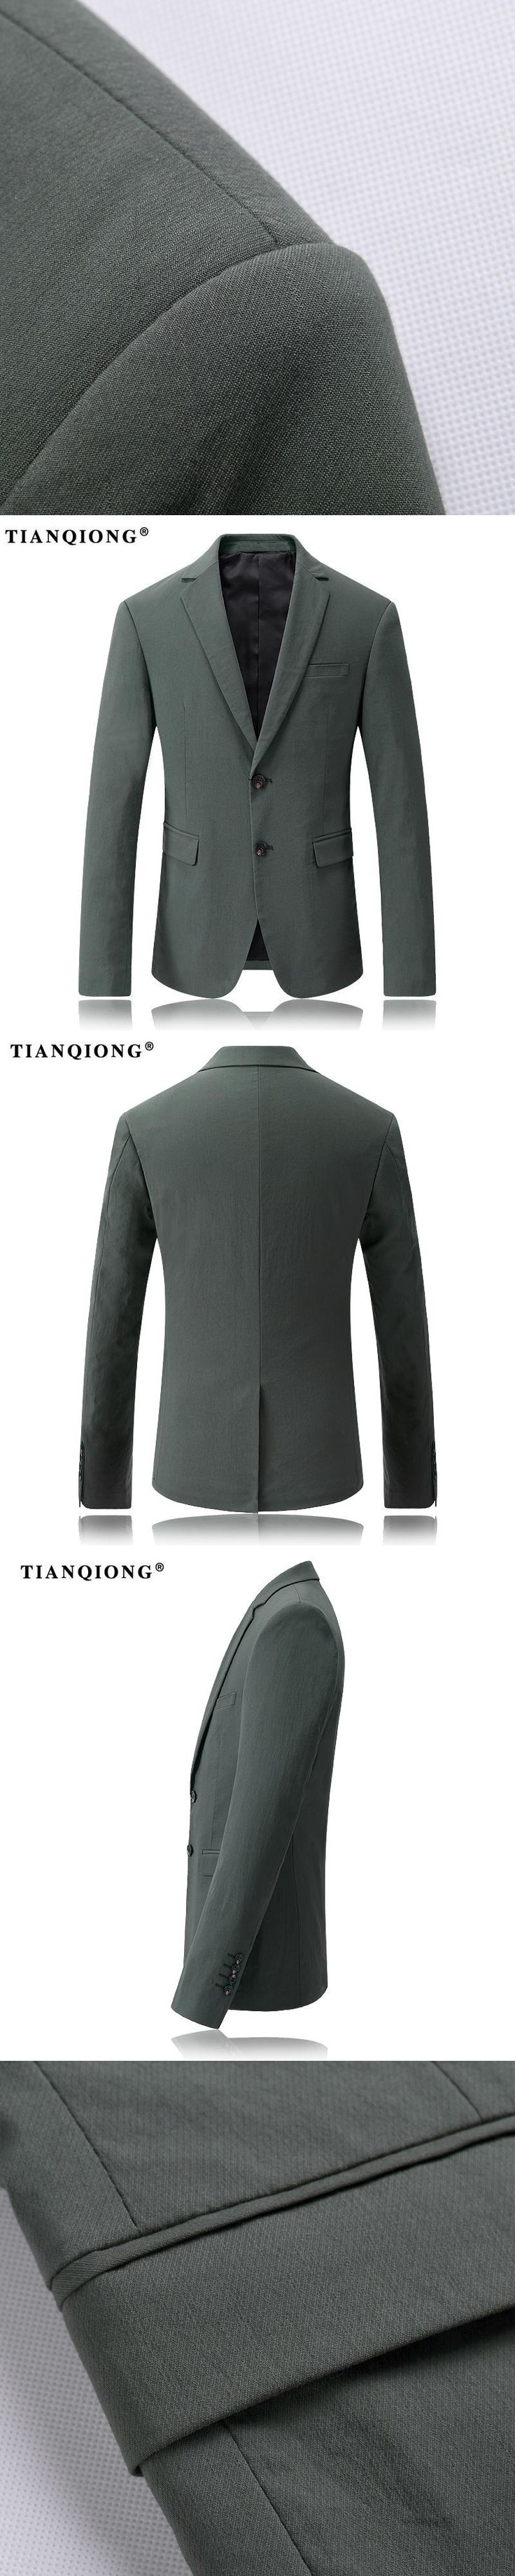 TIAN QIONG Hot Sale New Fashion Blazer Mens Casual Jacket Solid Dark-Green Color Men Blazer Jacket Classic Men Suit Jackets Coat